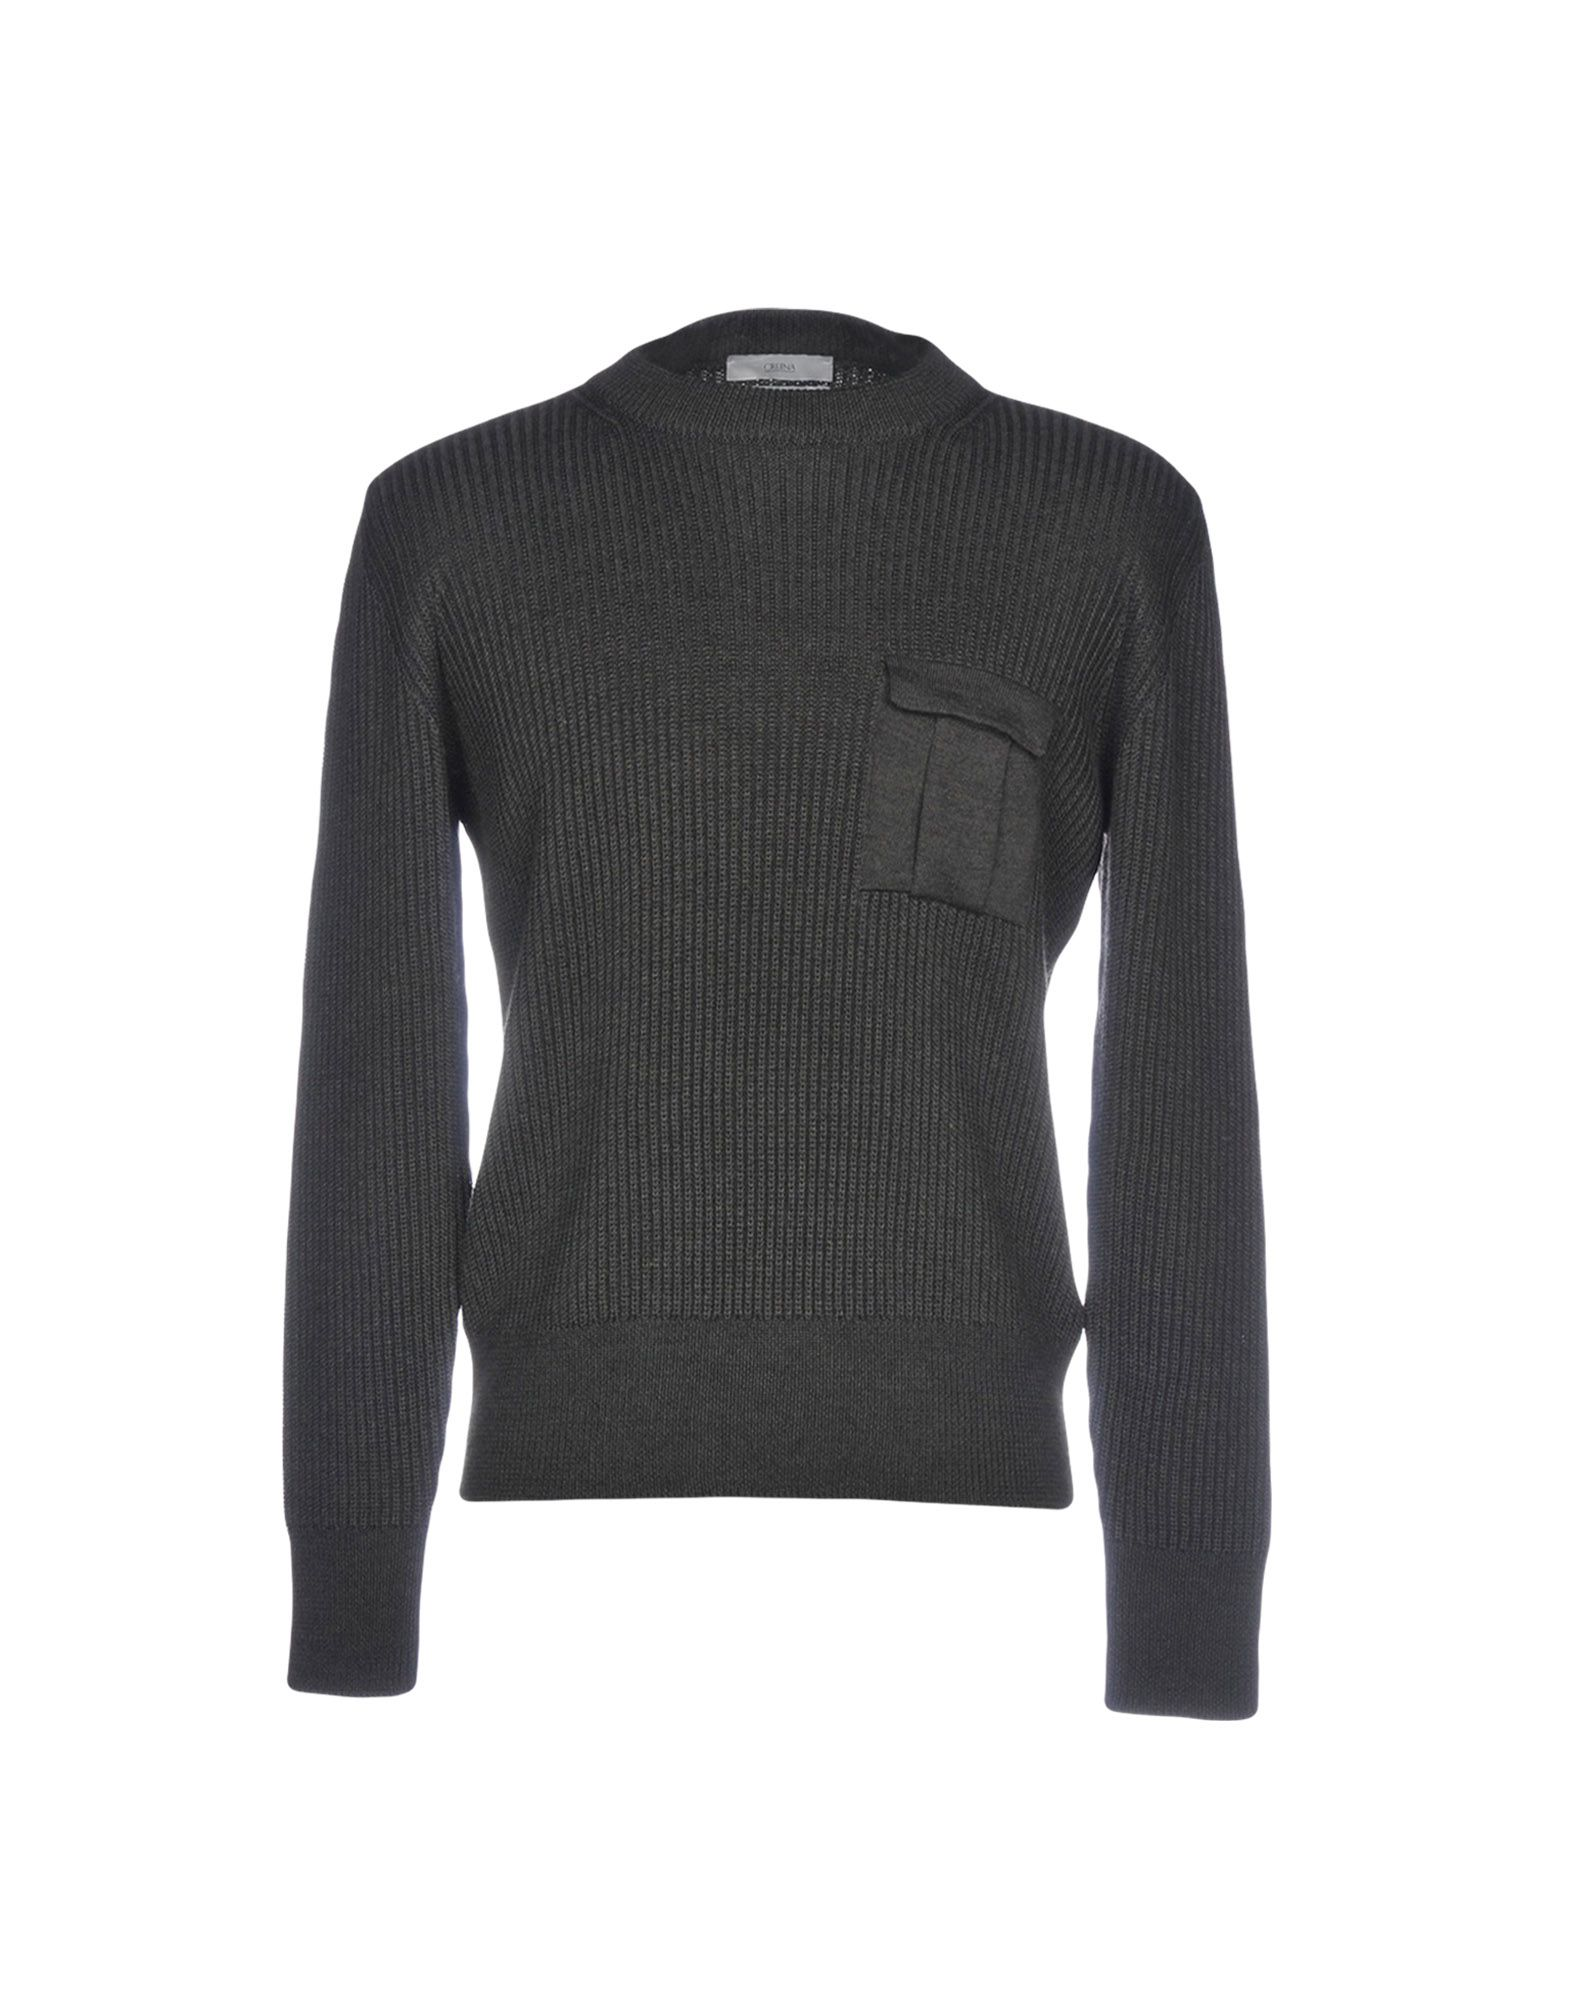 CRUNA Sweater in Steel Grey